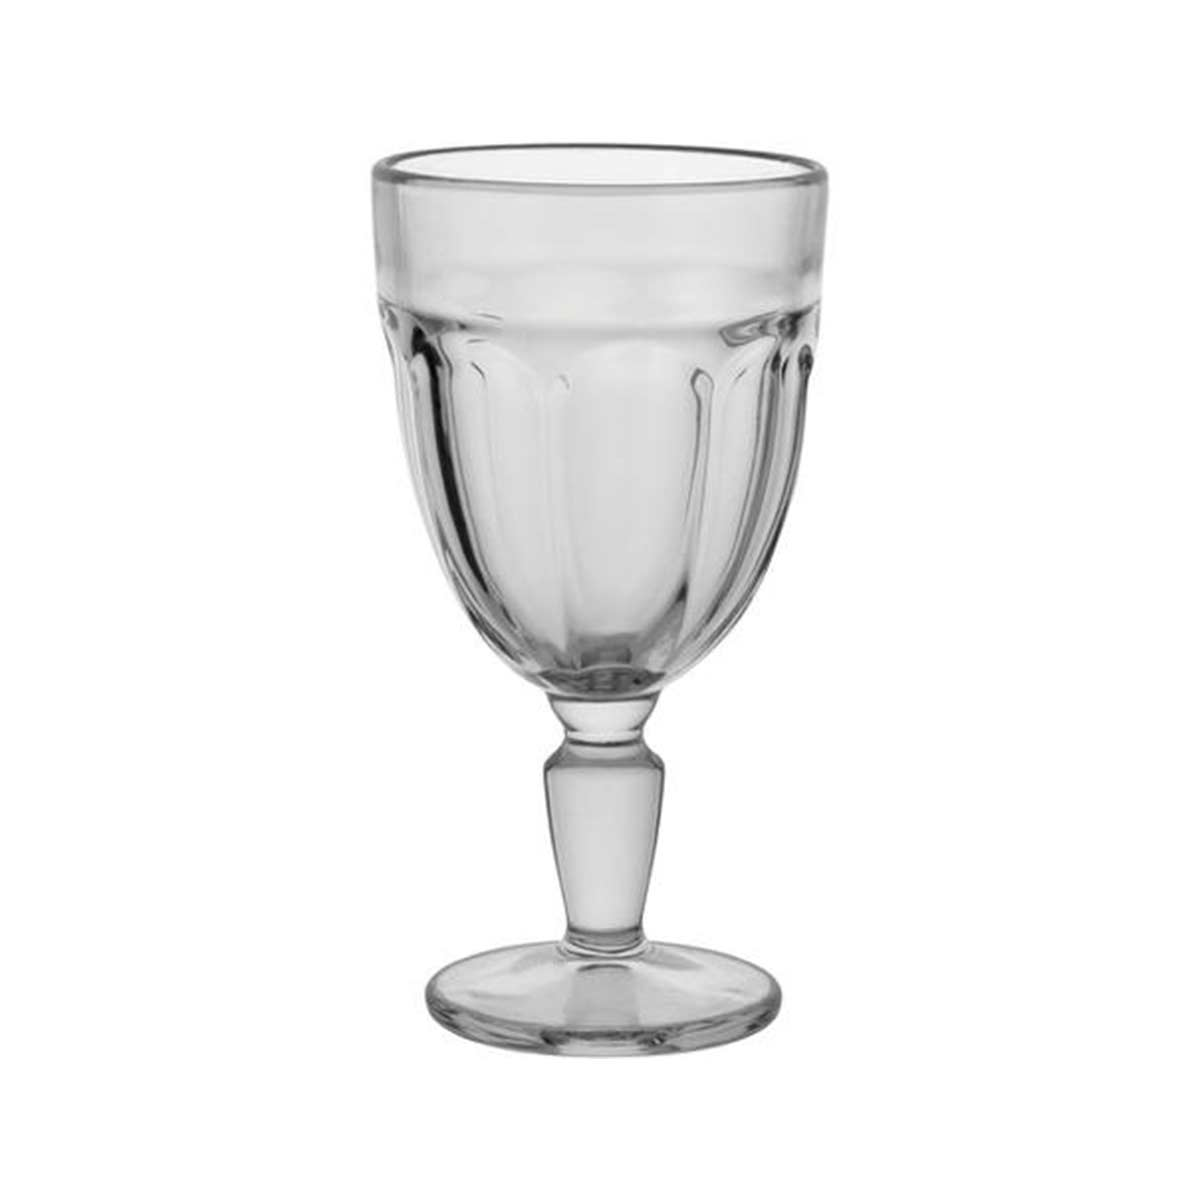 Jogo 8 Taças de Vidro Transparente Gavin 310 ml  - Lemis